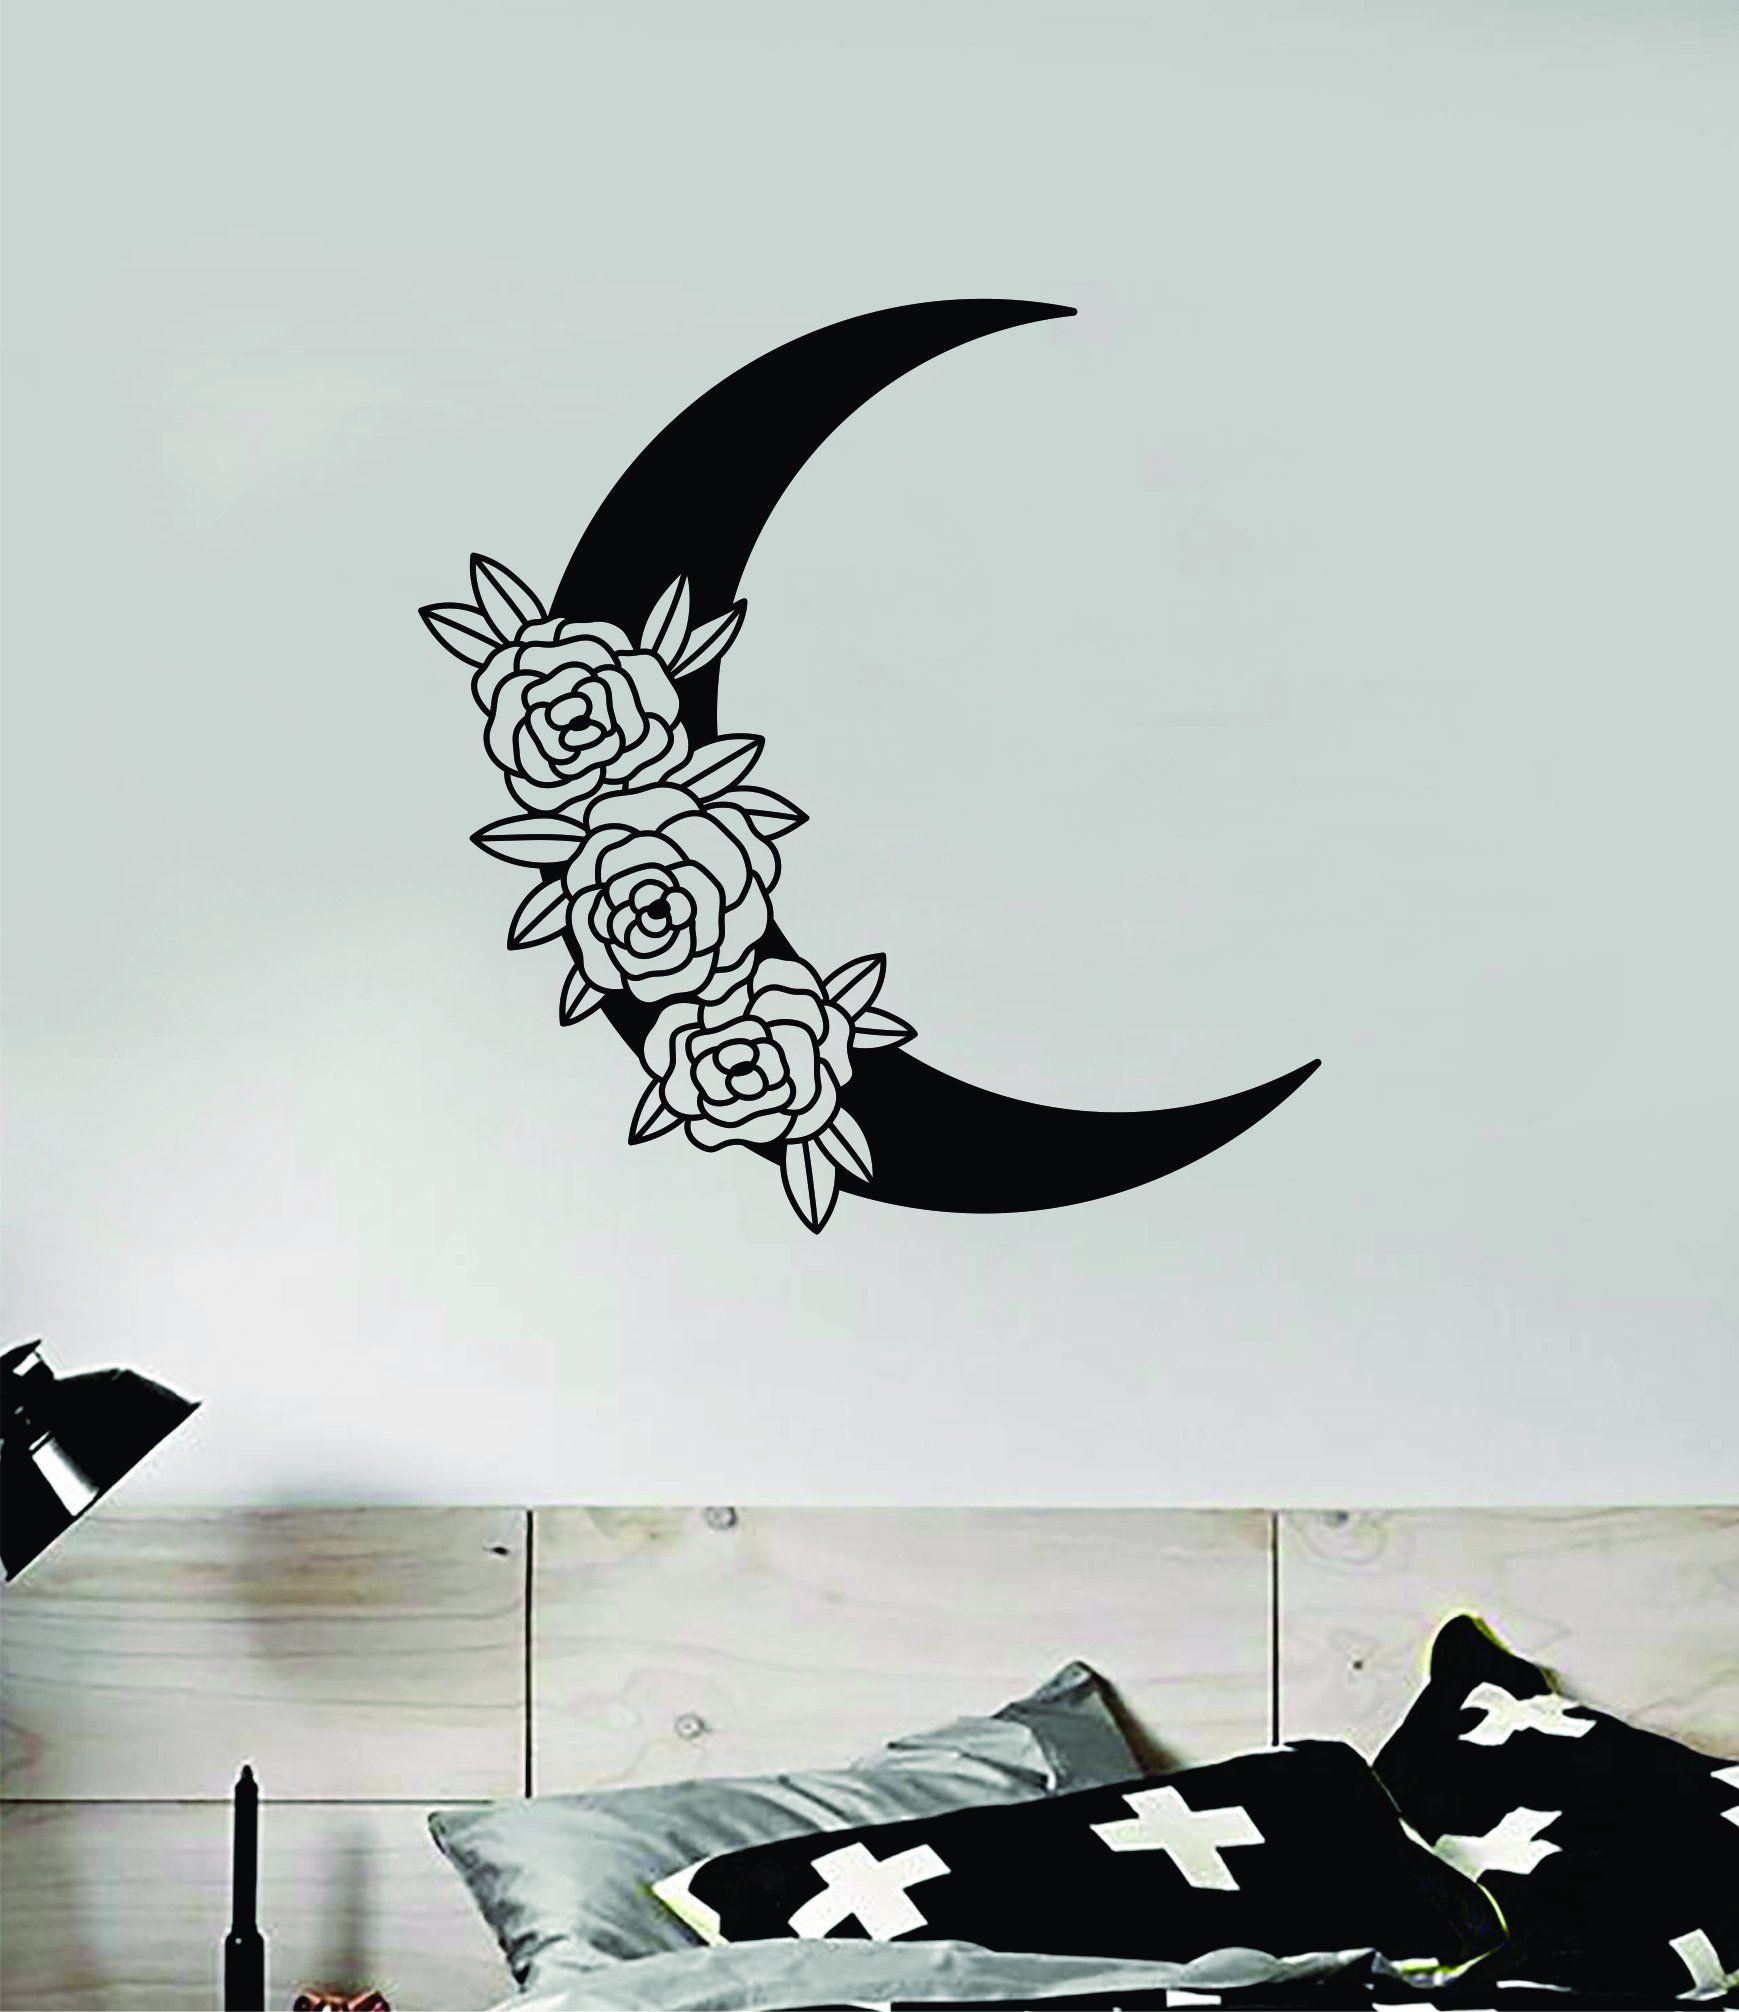 Moon Roses Wall Decal Sticker Vinyl Art Wall Bedroom Room Home Decor Teen Inspirational Girls Tattoo Boho Nature Space - black